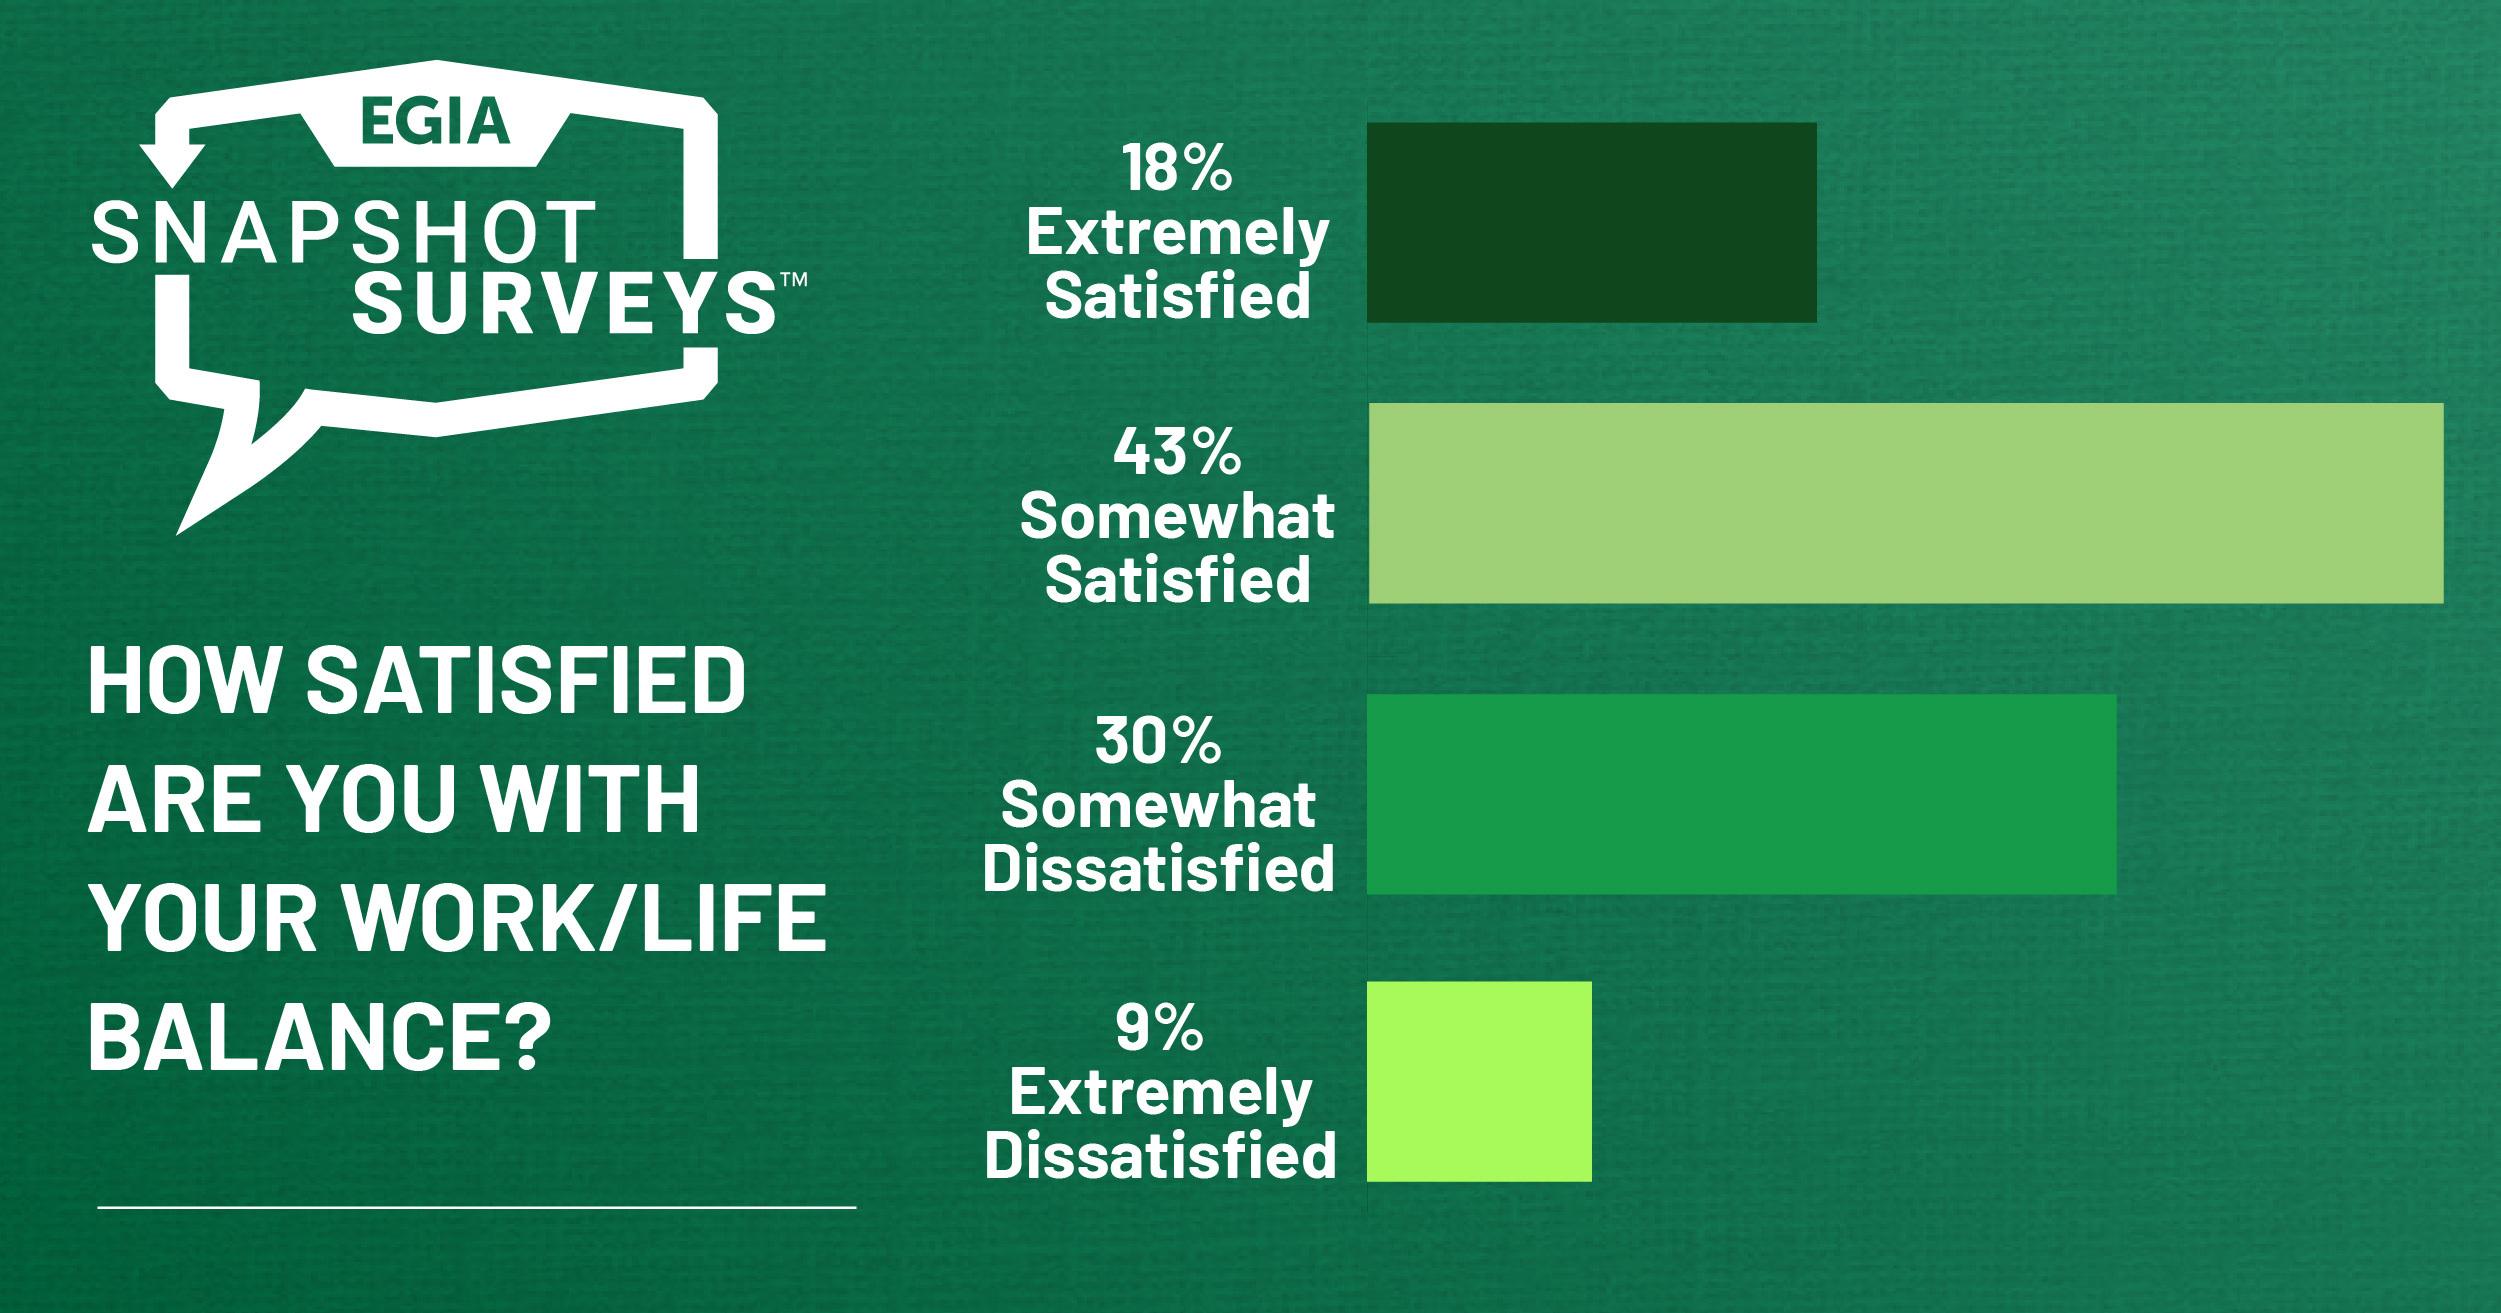 EGIA Snapshot Survey - Work-Life Balance